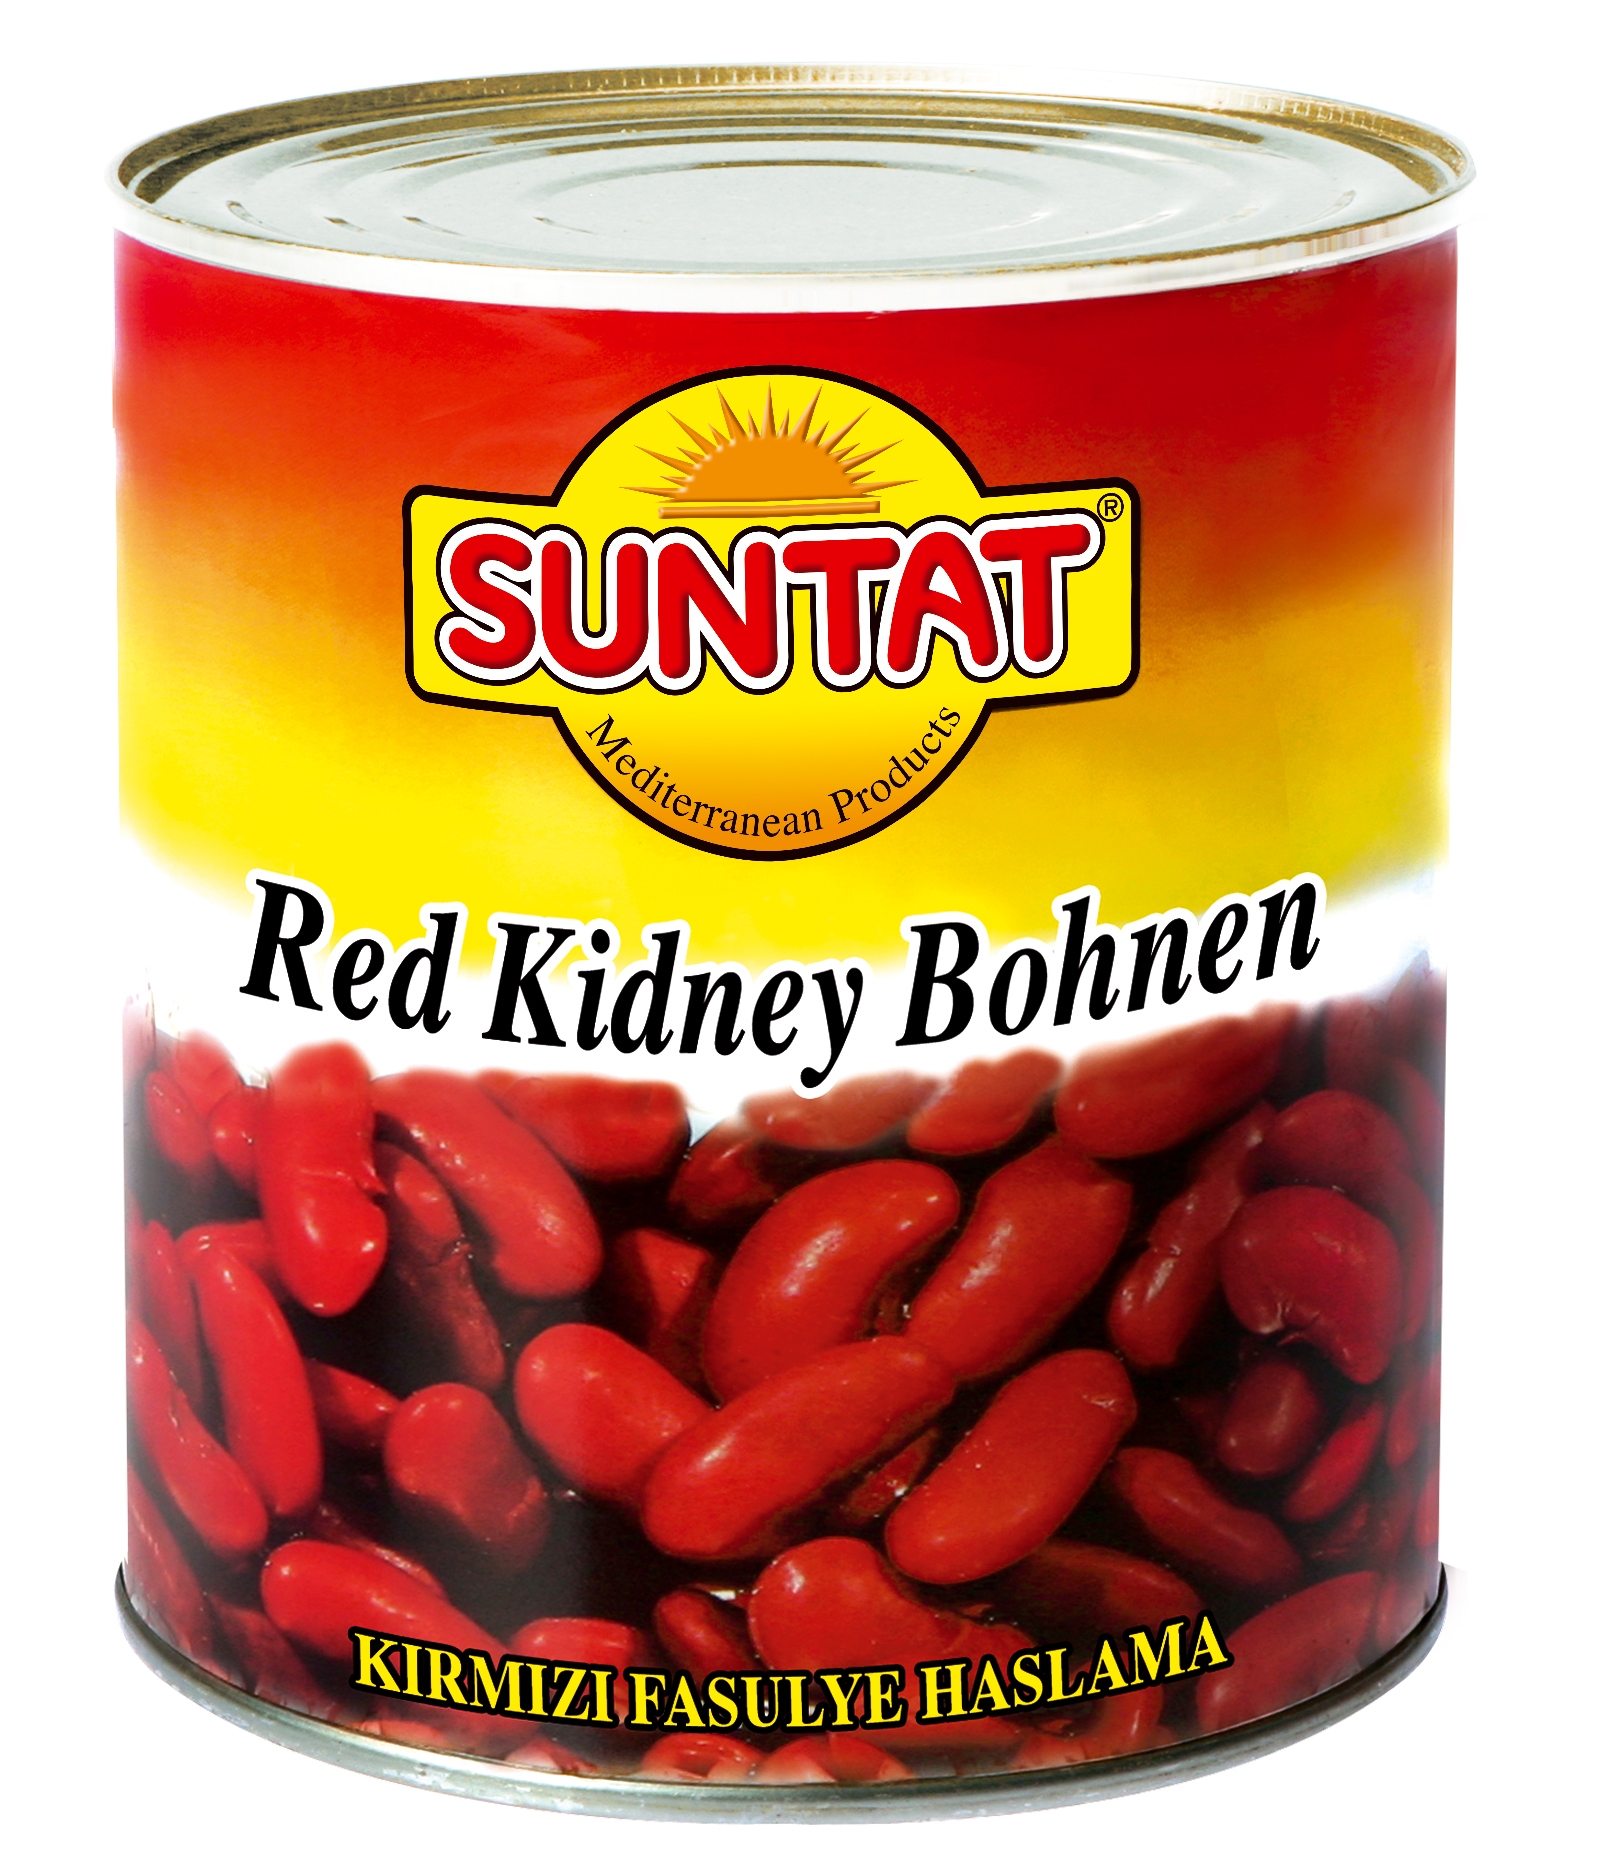 Suntat Rote Kidney Bohnen Dose